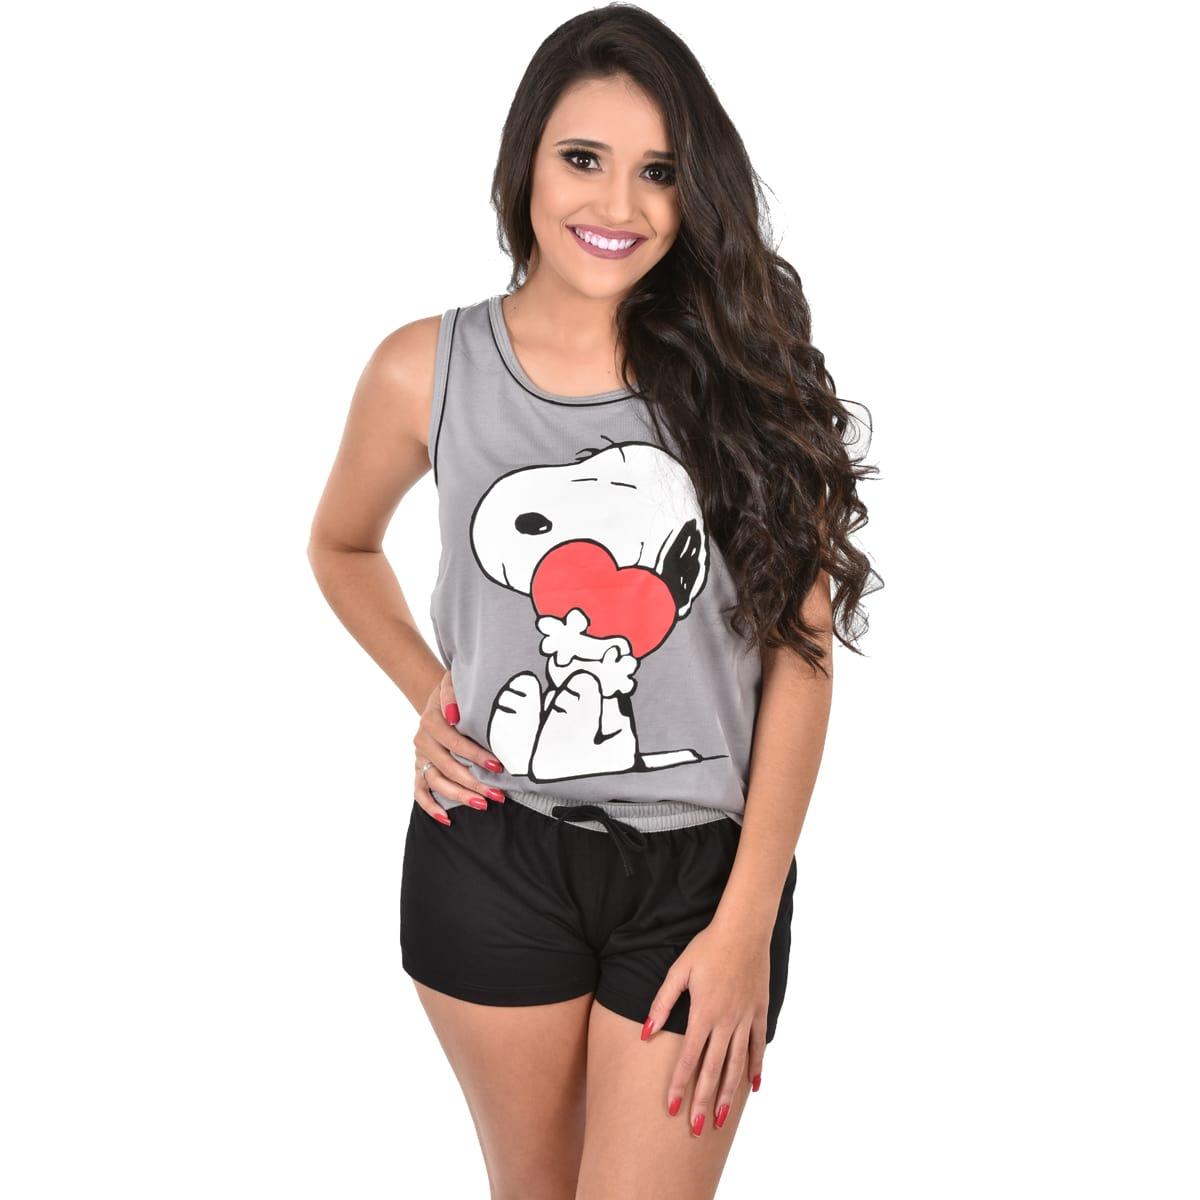 Baby Doll Regata Short Snoopy Família Feminino Adulto 328